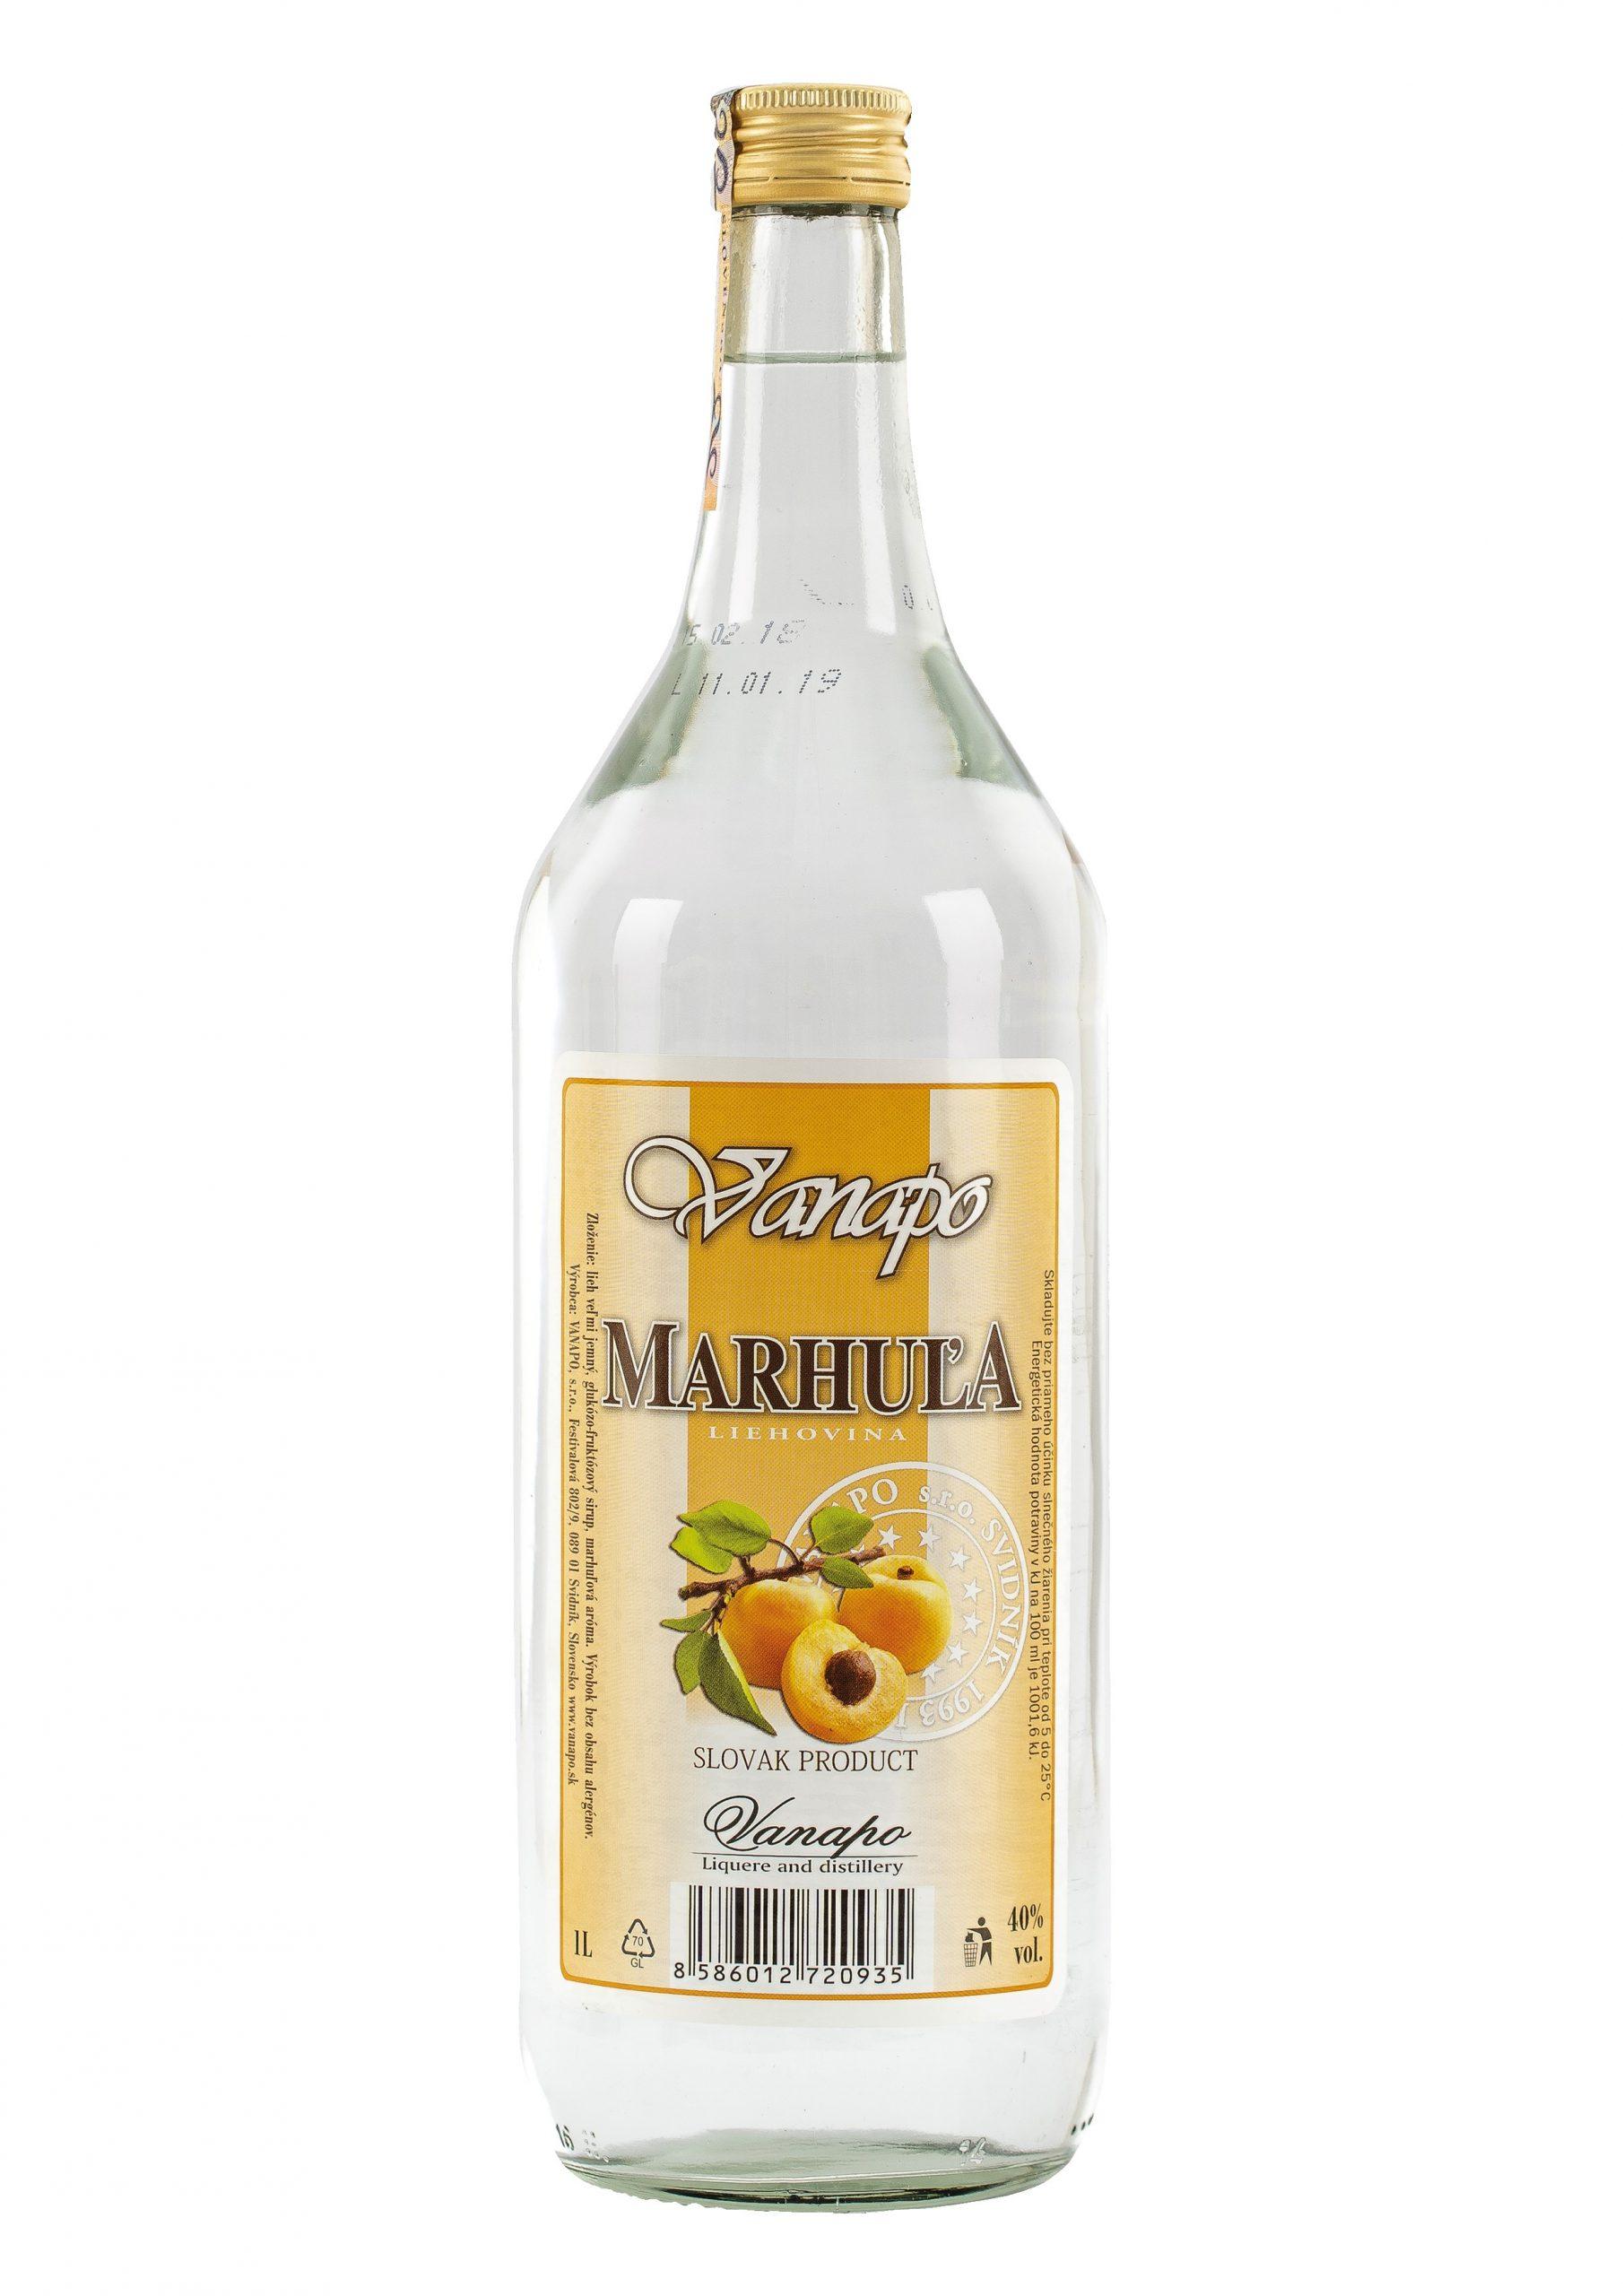 Marhula 40 1L scaled 1 - Marhuľa Vanapo